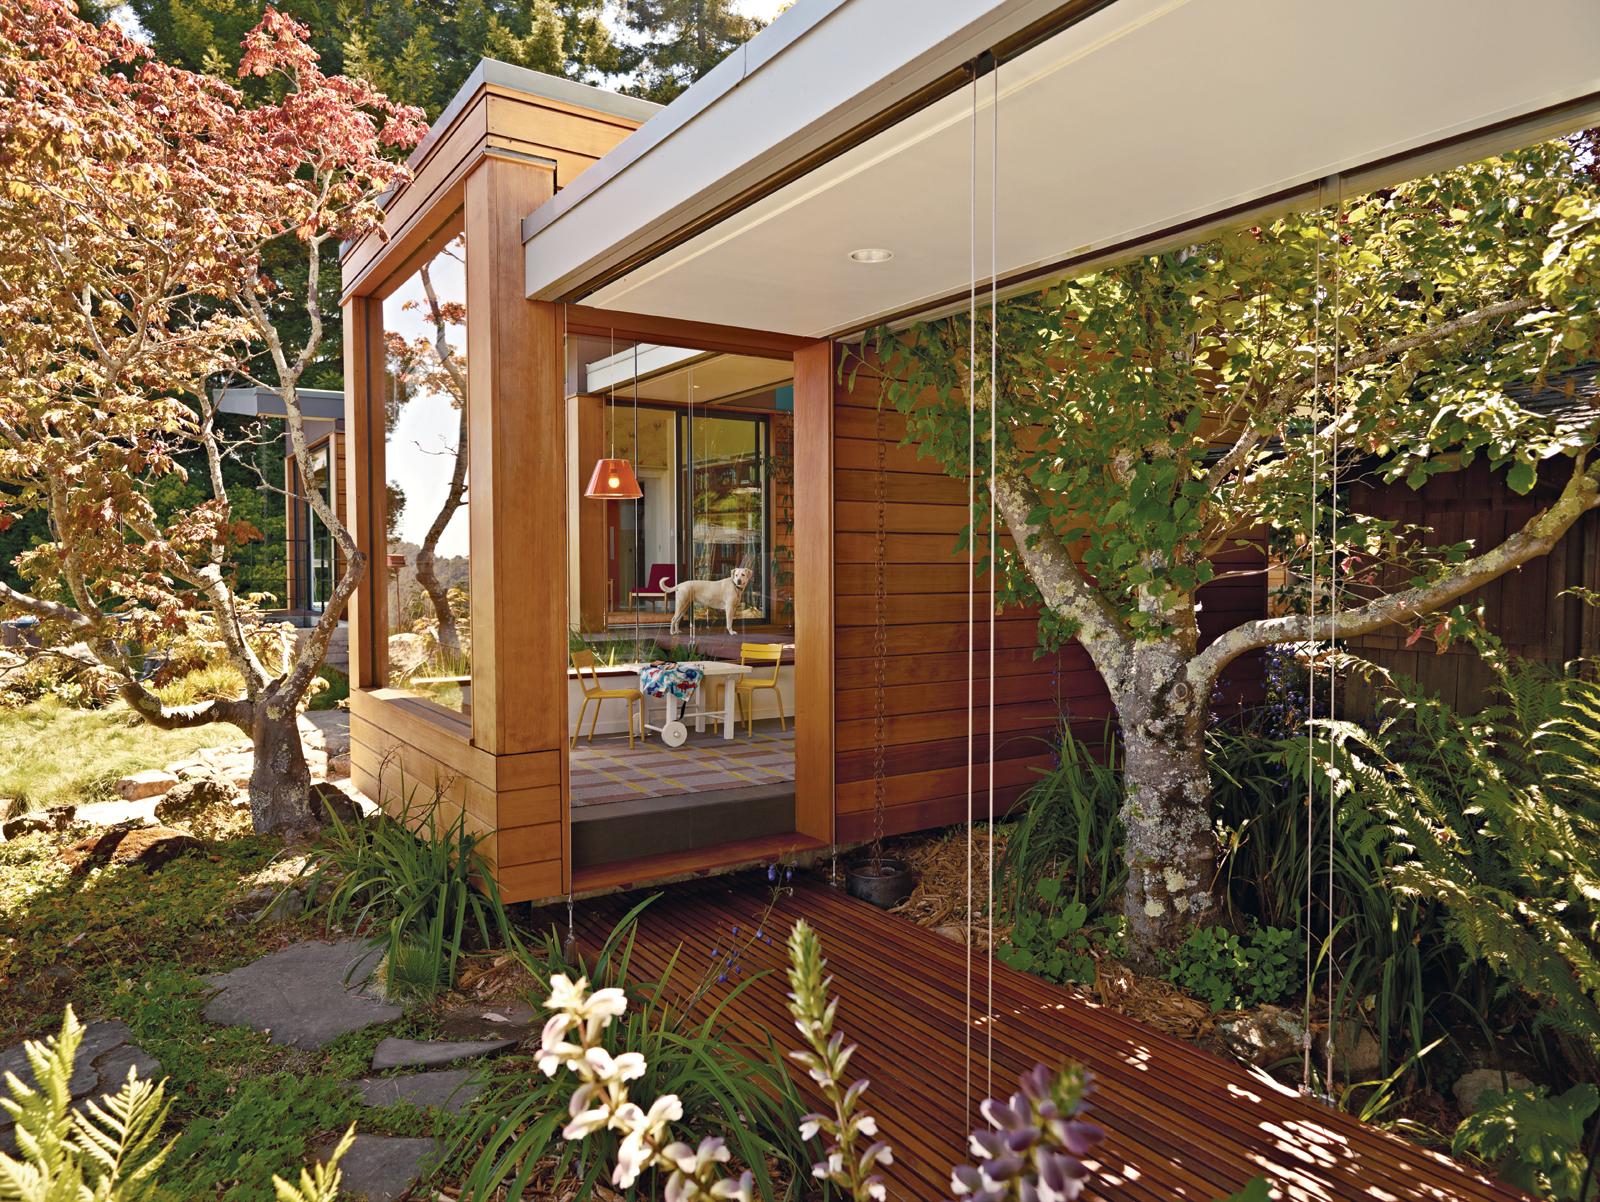 Open-air tearoom designed by Joseph Esherick